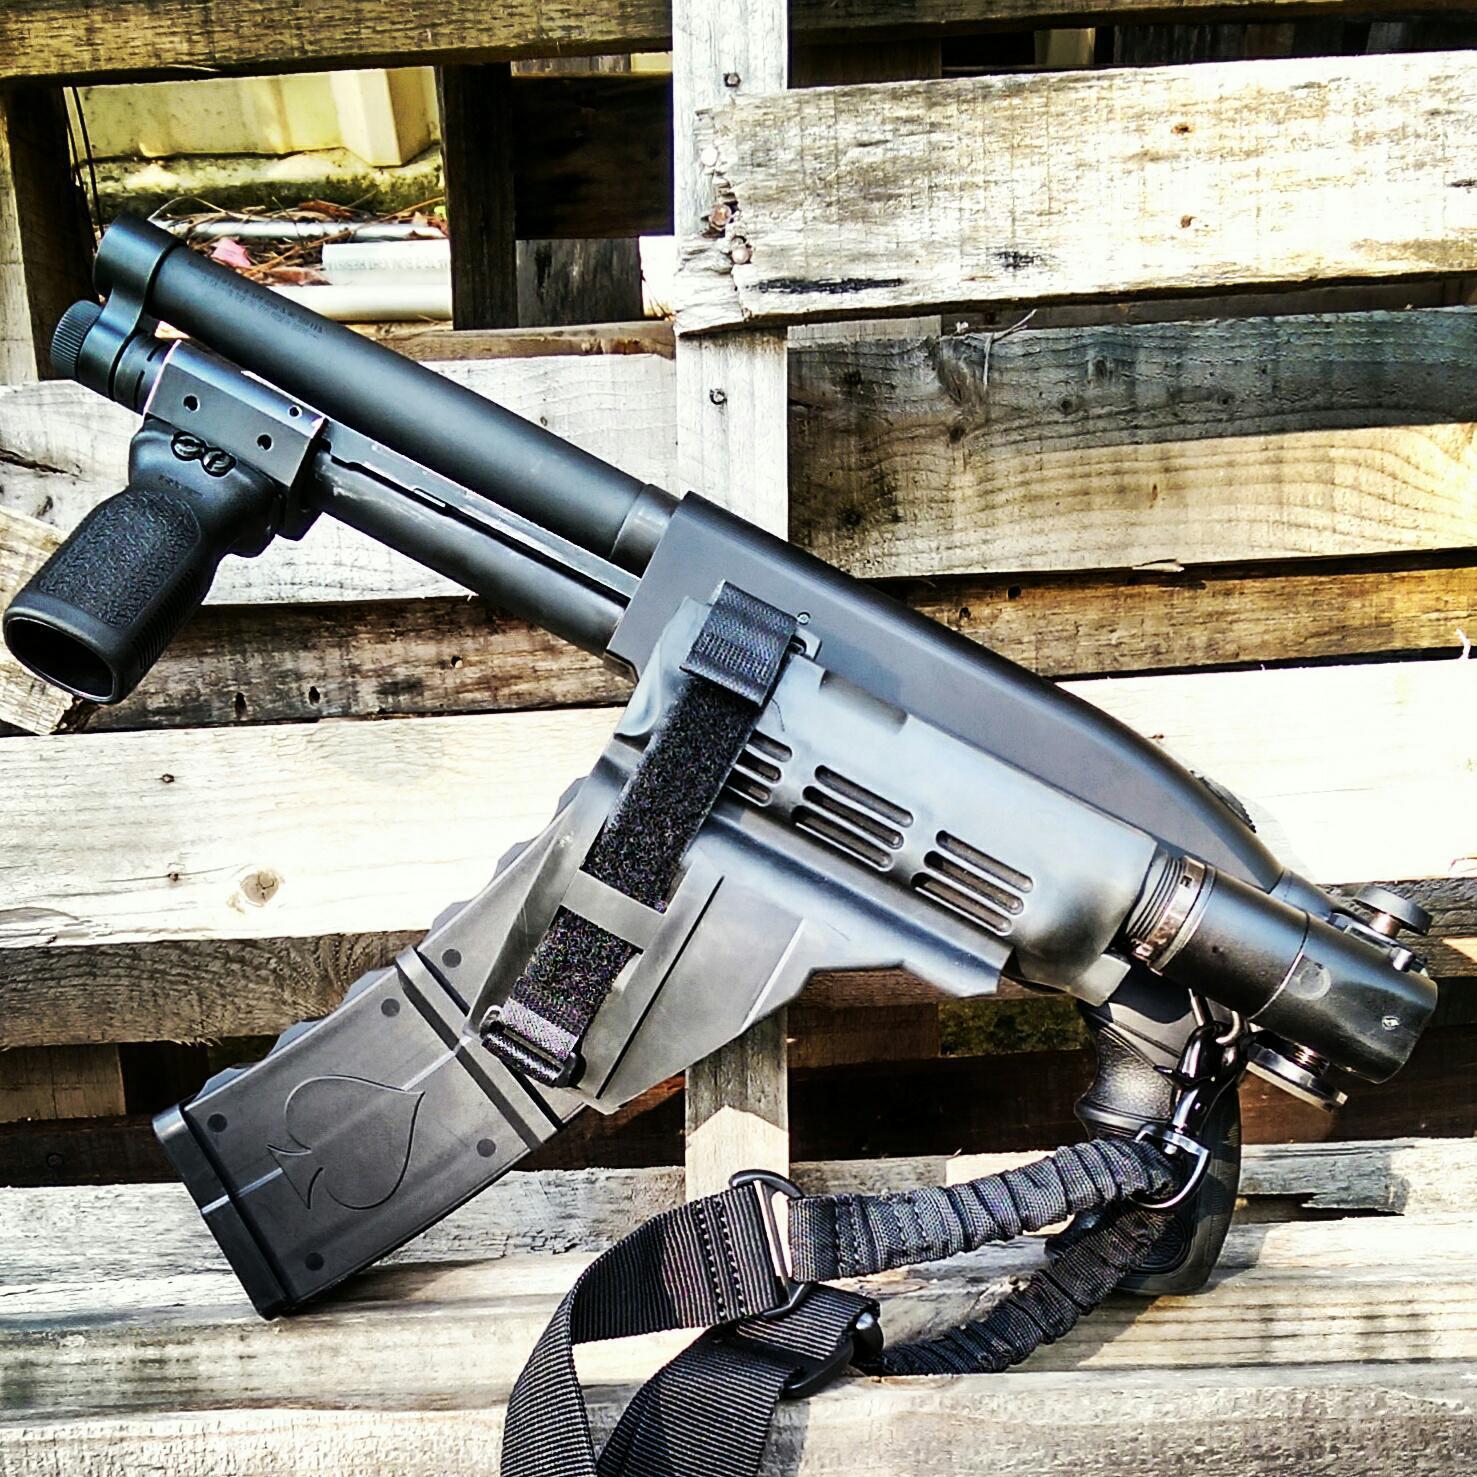 Black Aces has a slick new ultra-compact 10+1 12-gauge